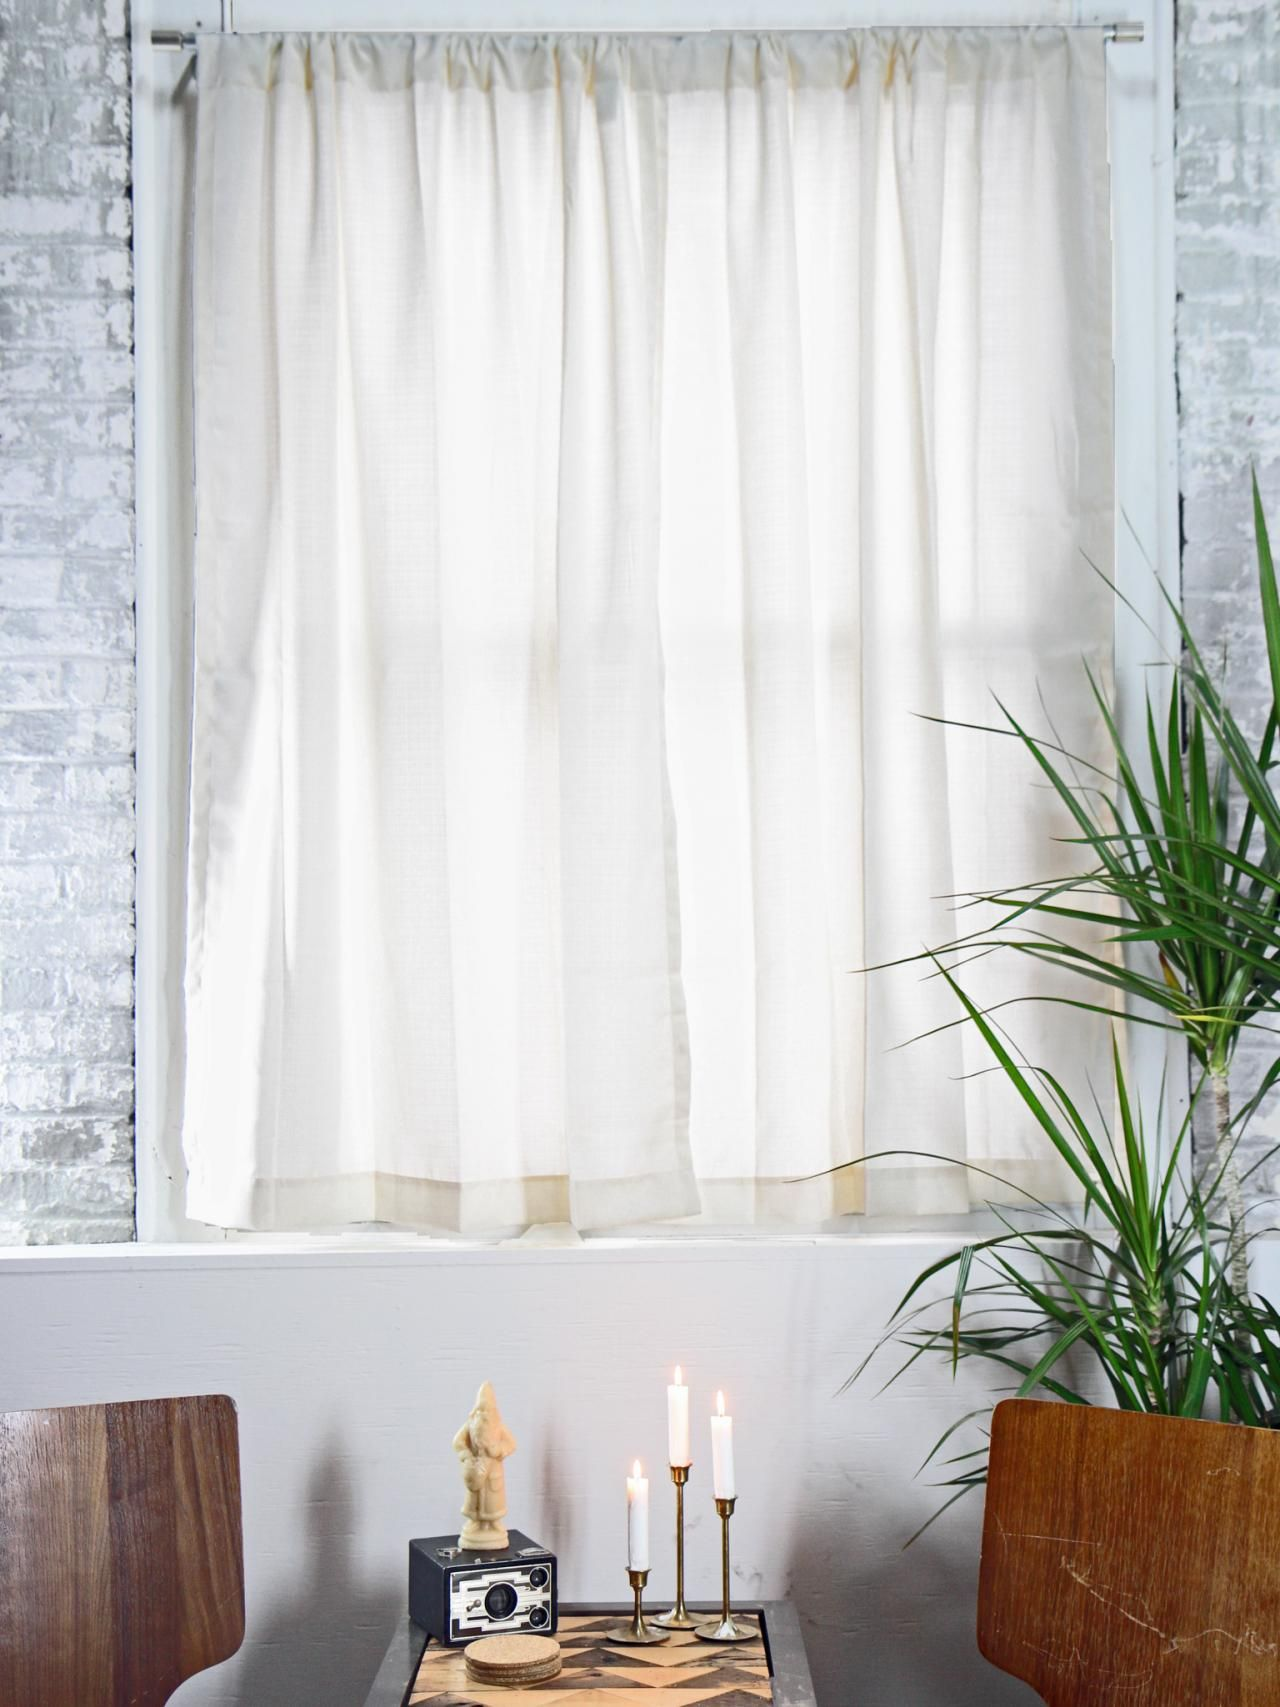 curtain rod on window casing